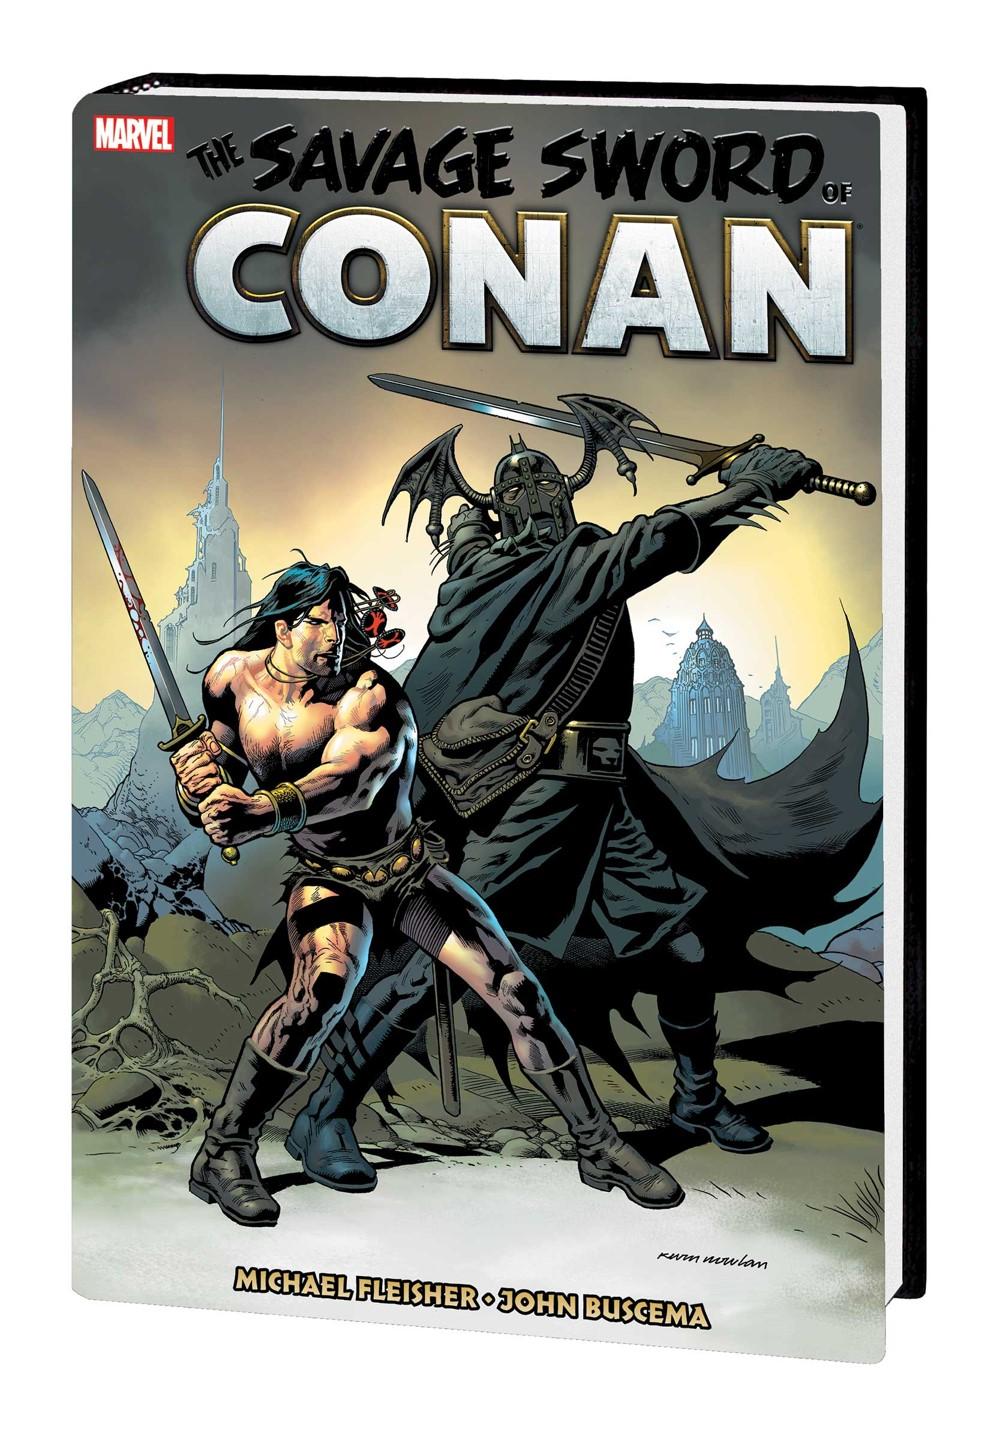 SSOCONANMAR_OMNIV07_HC_NOWLAN Marvel Comics December 2021 Solicitations